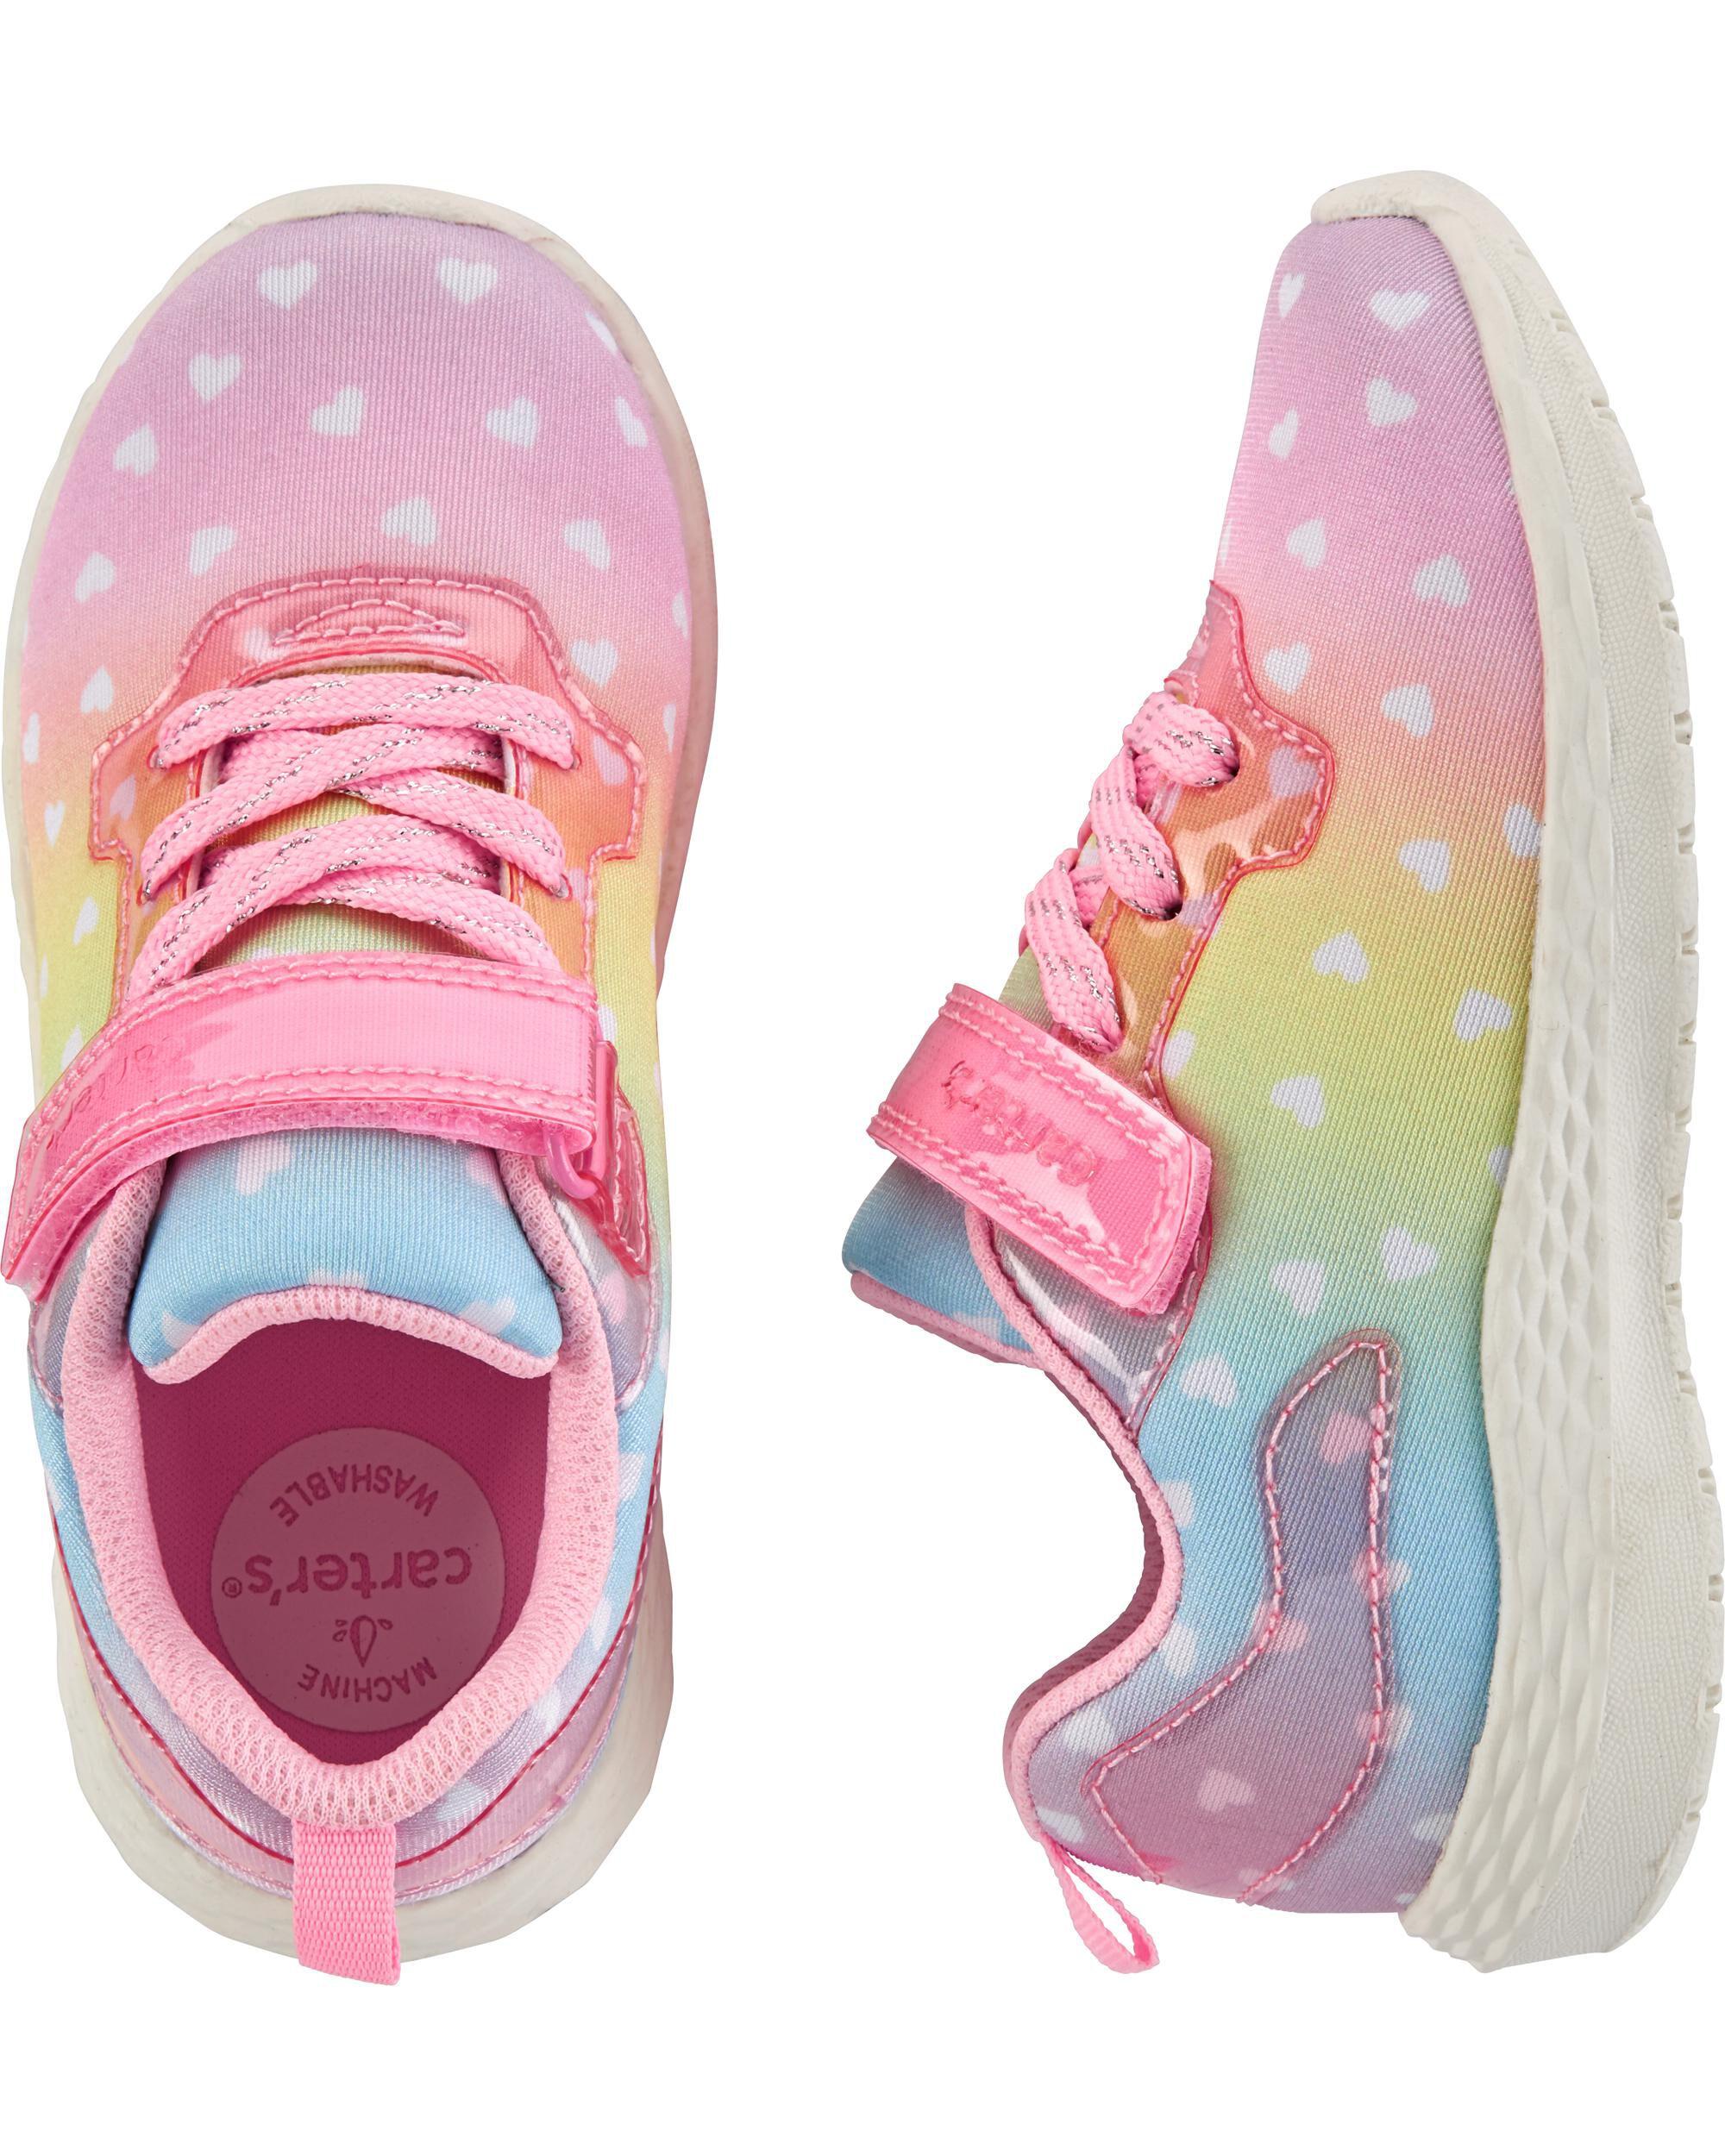 ladies baby shoes